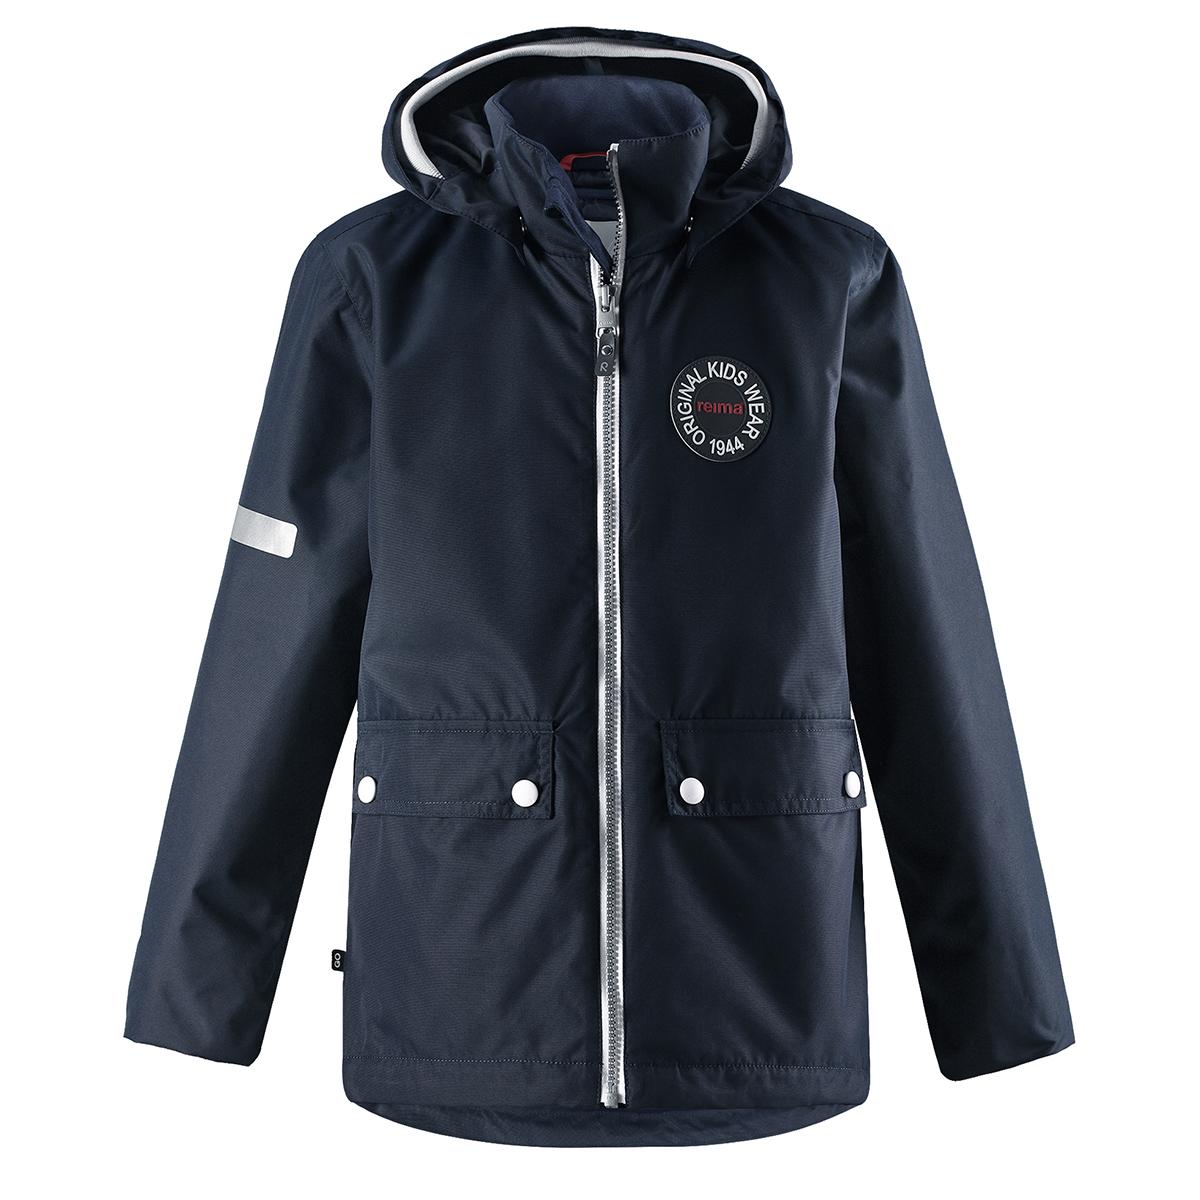 22f5bc01efa63 Куртка 2-в-1 Reimatec Taag, Reima арт.521528-6980